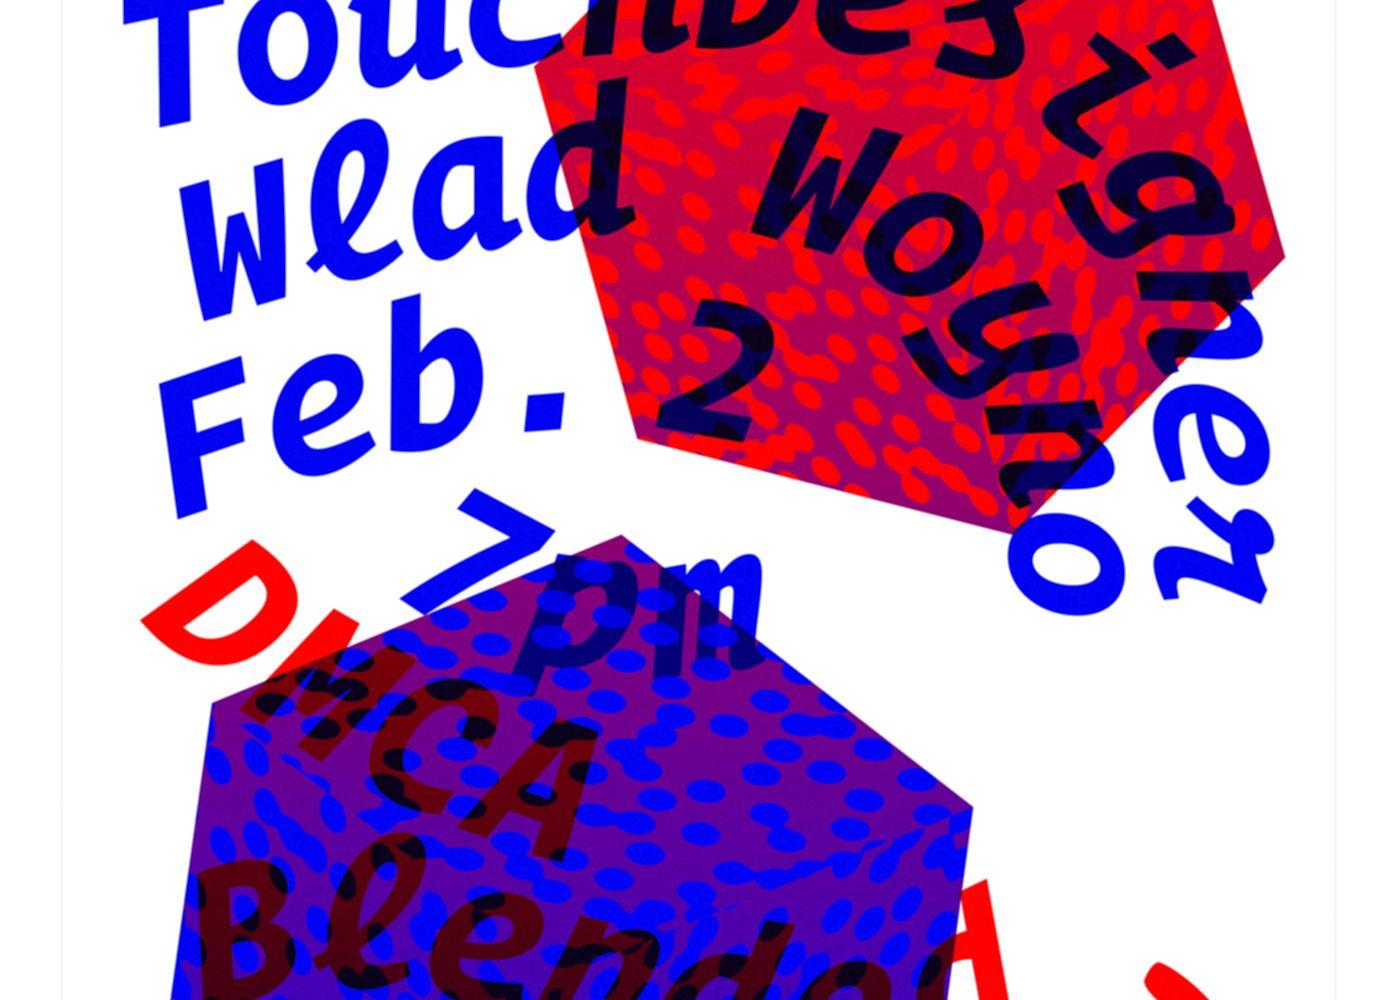 Detail of TouchDesigner poster